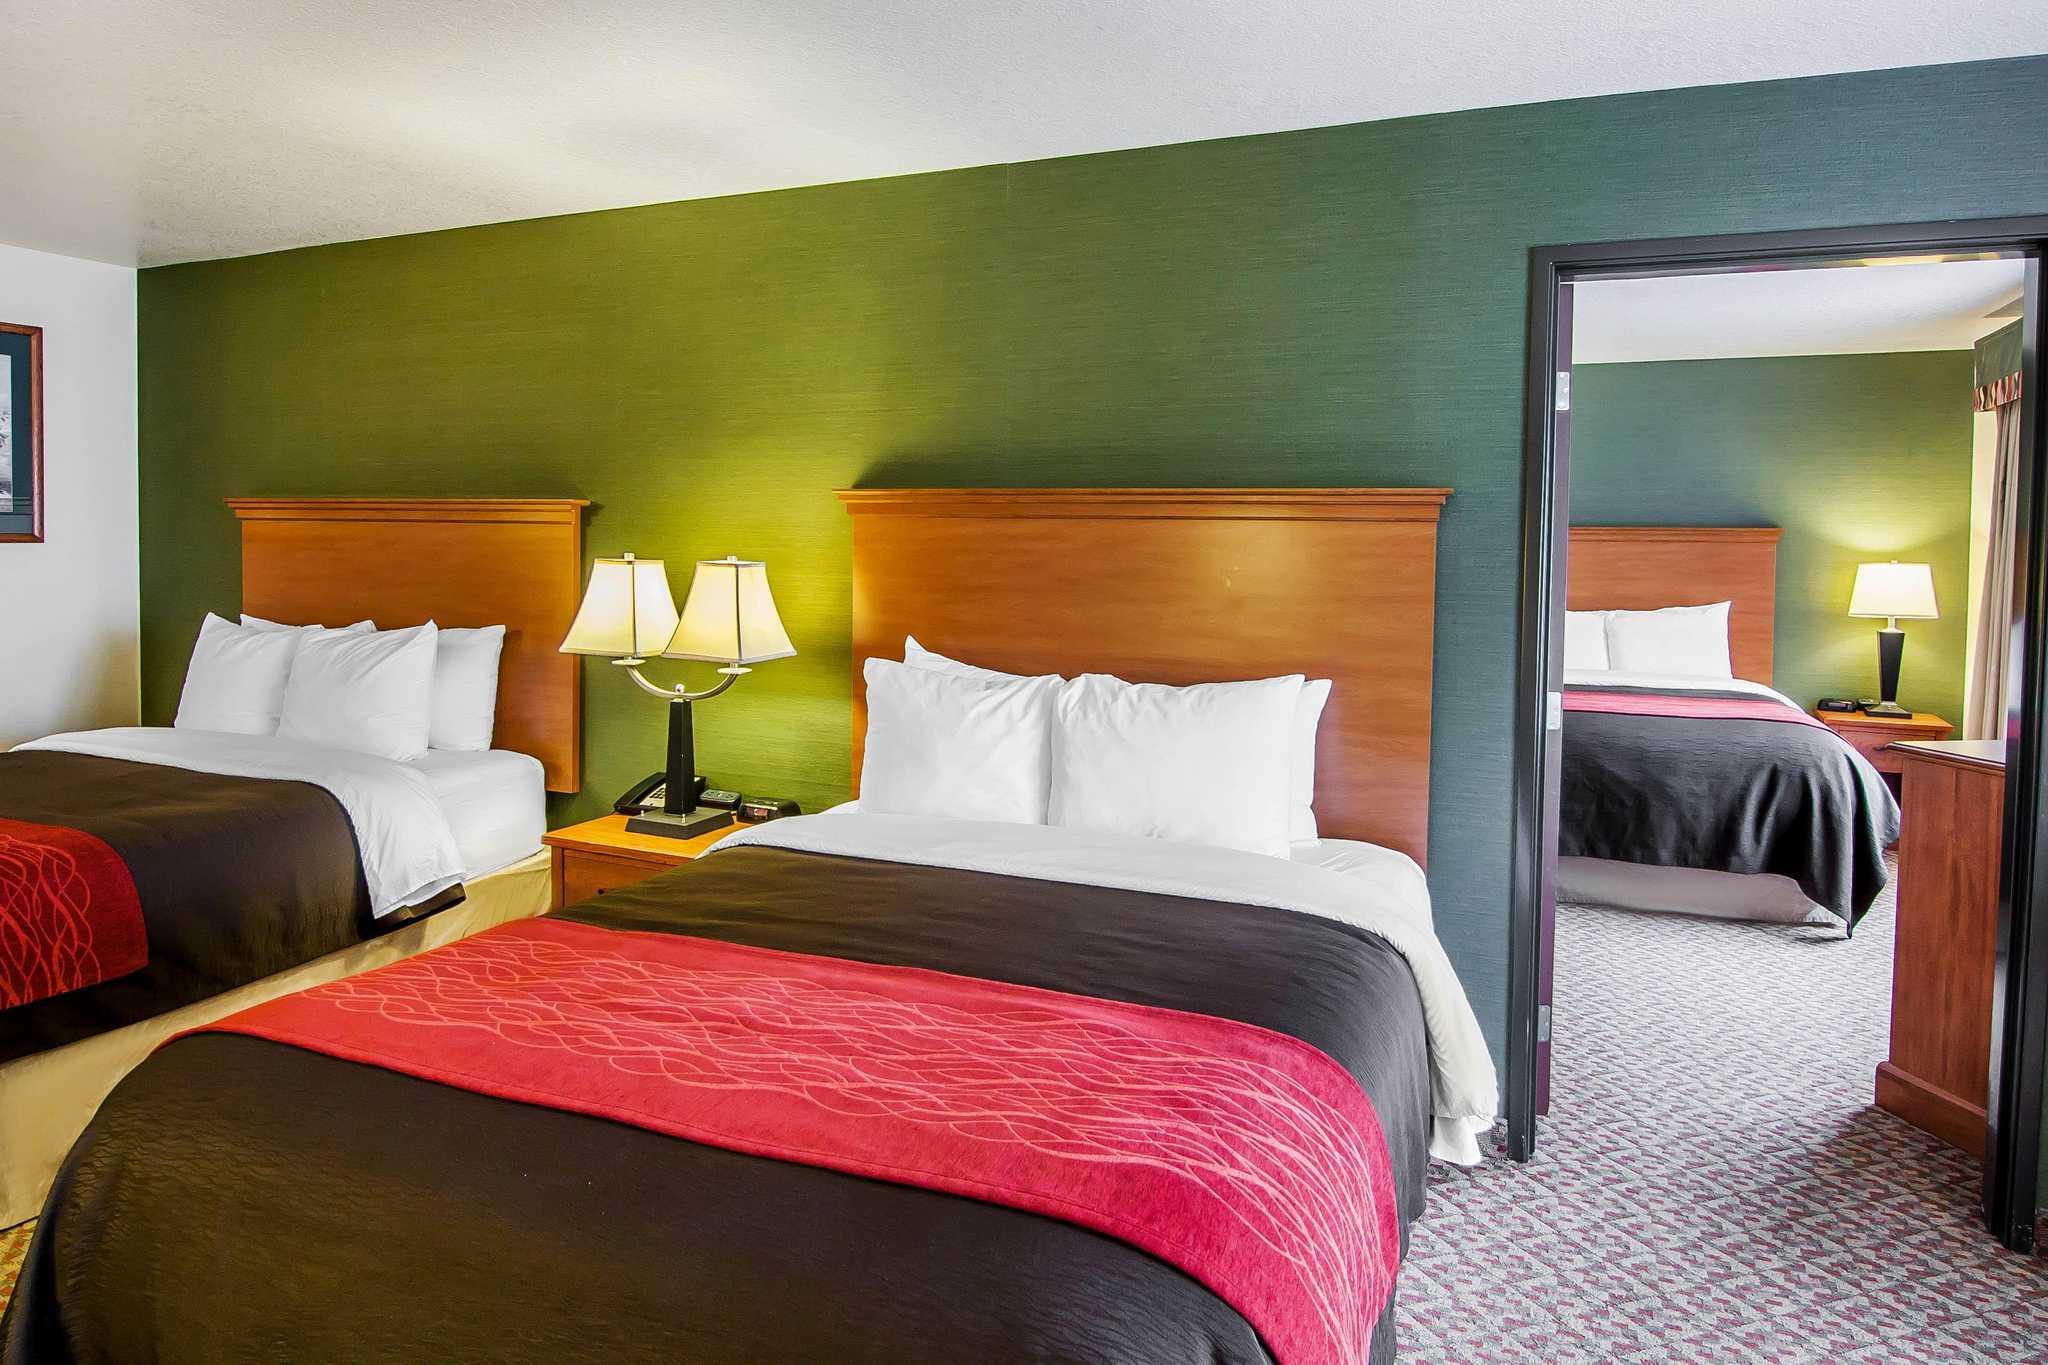 Comfort Inn & Suites image 48